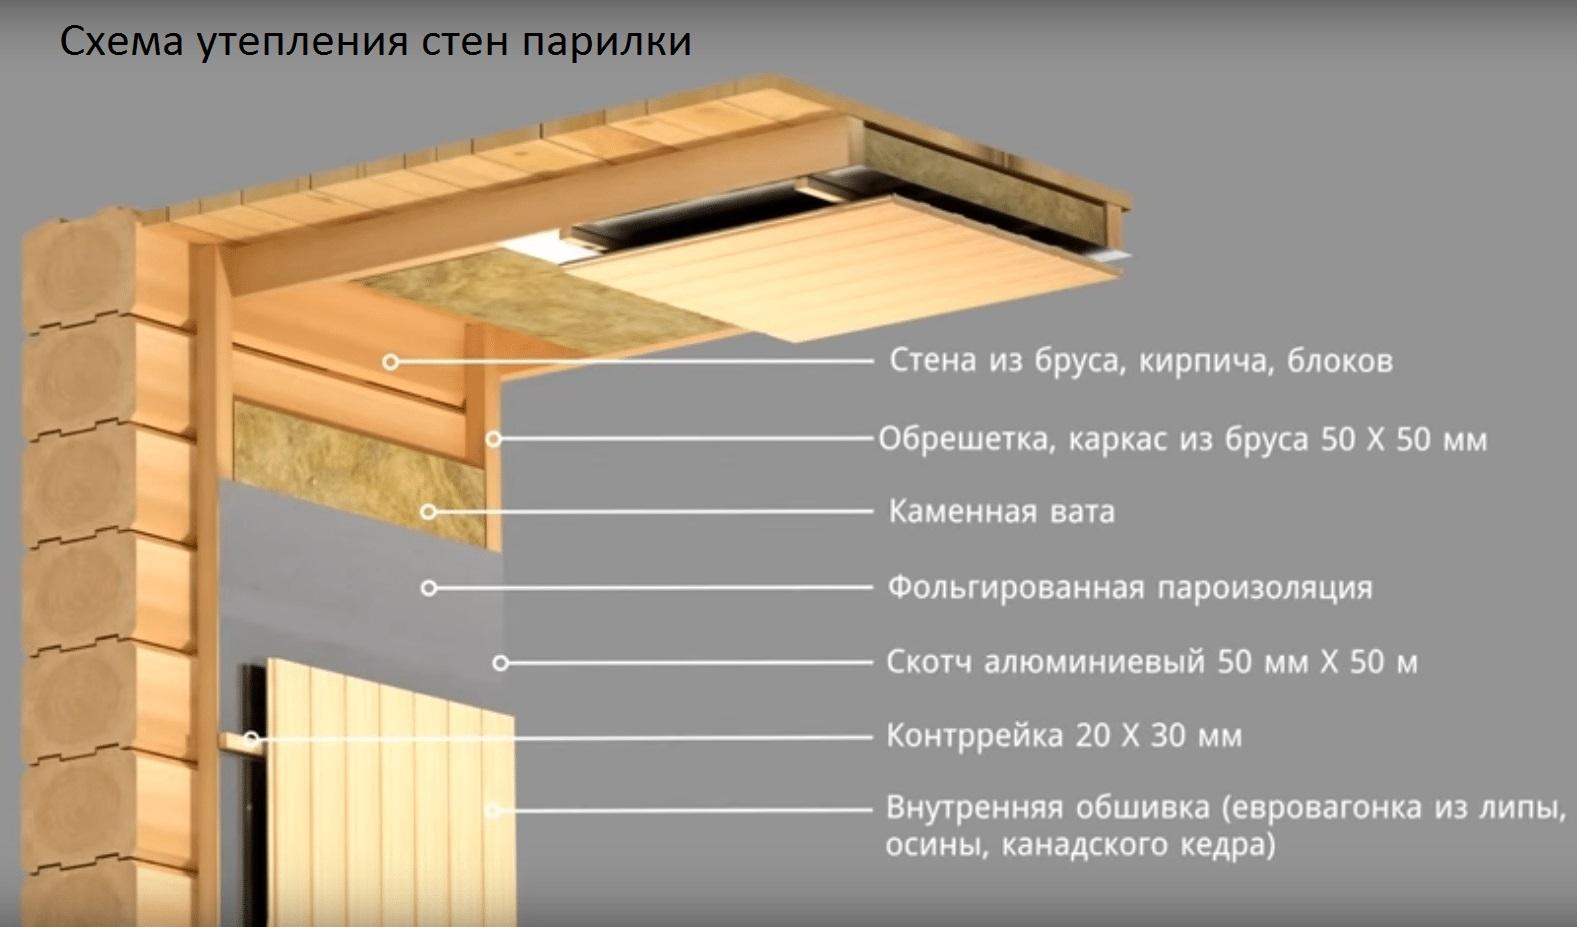 Схема утепления стен парилки